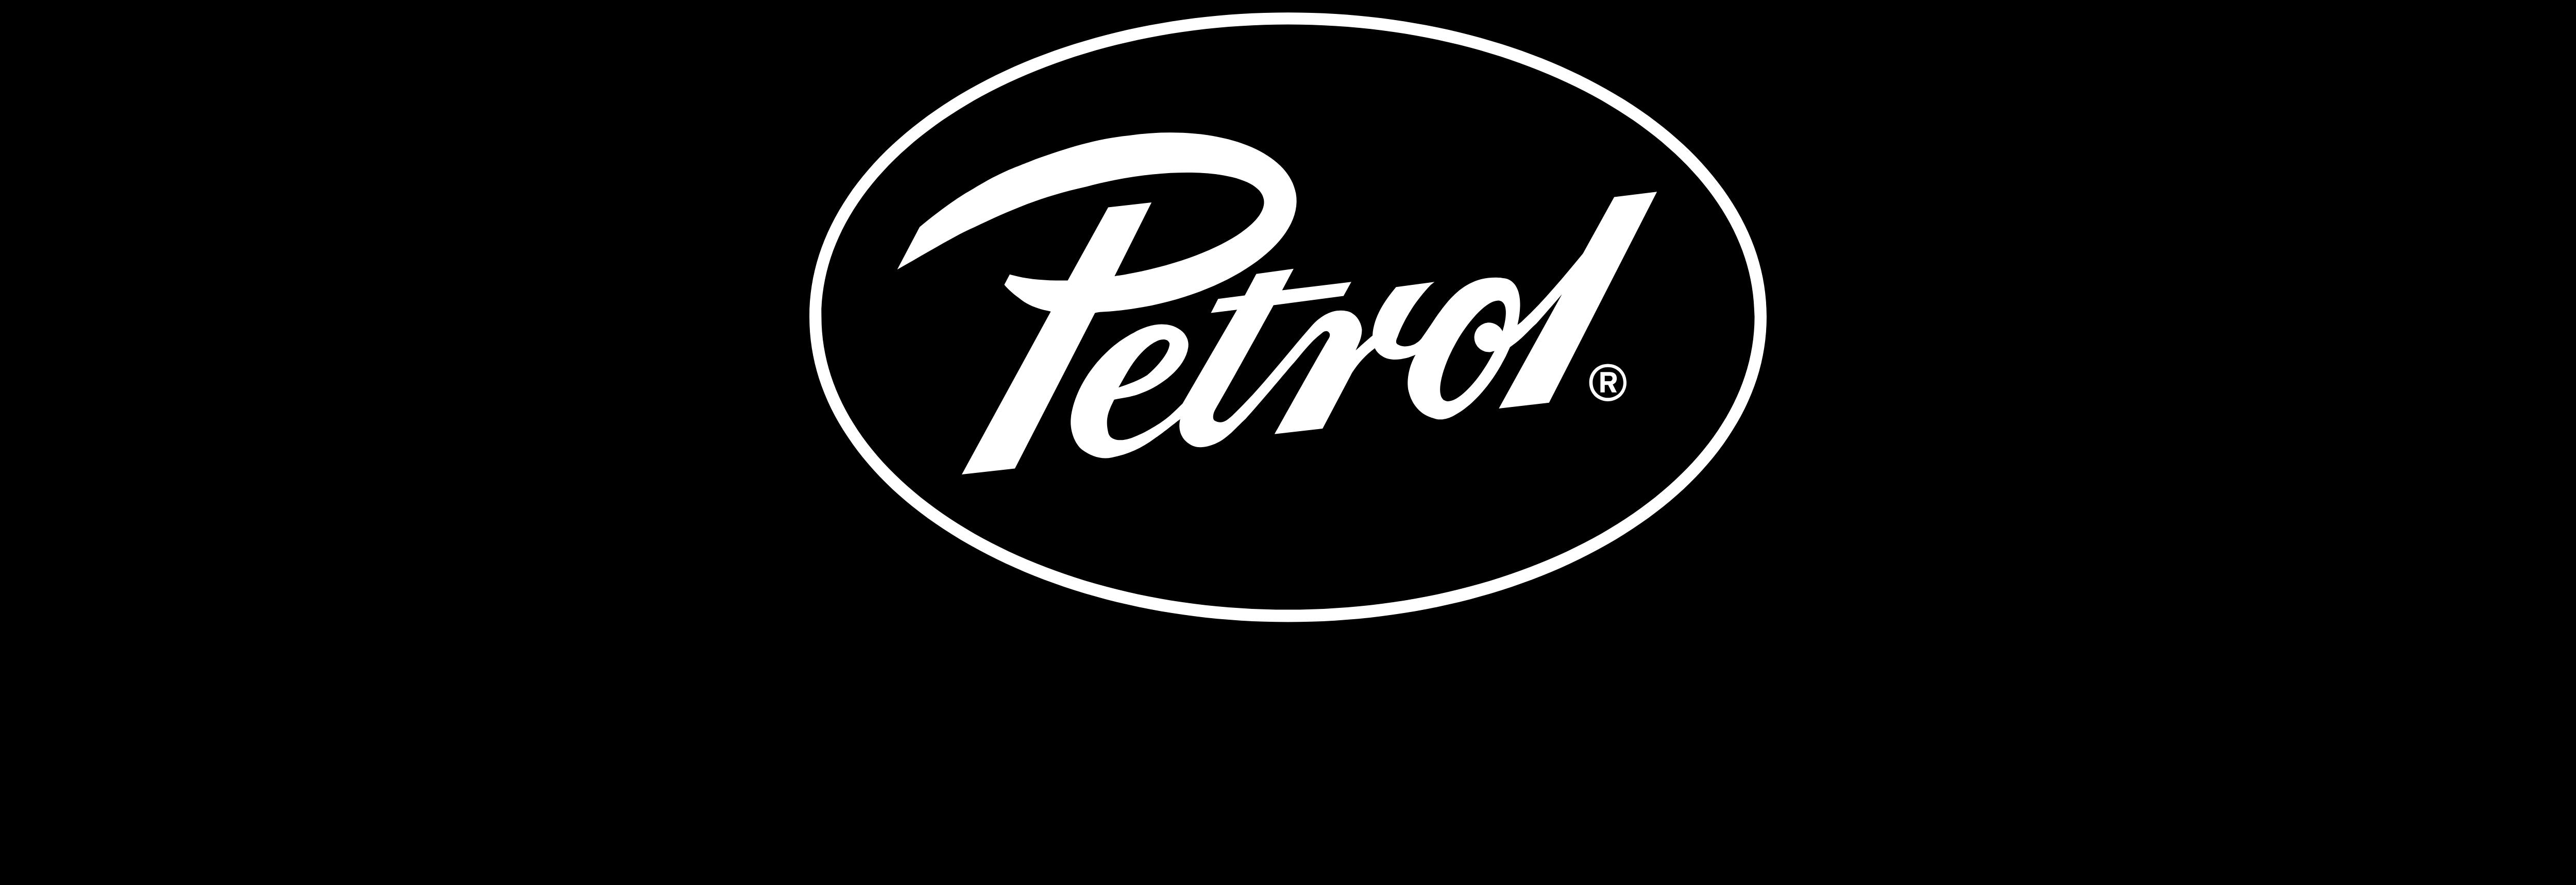 petrol industries  u2013 logos download